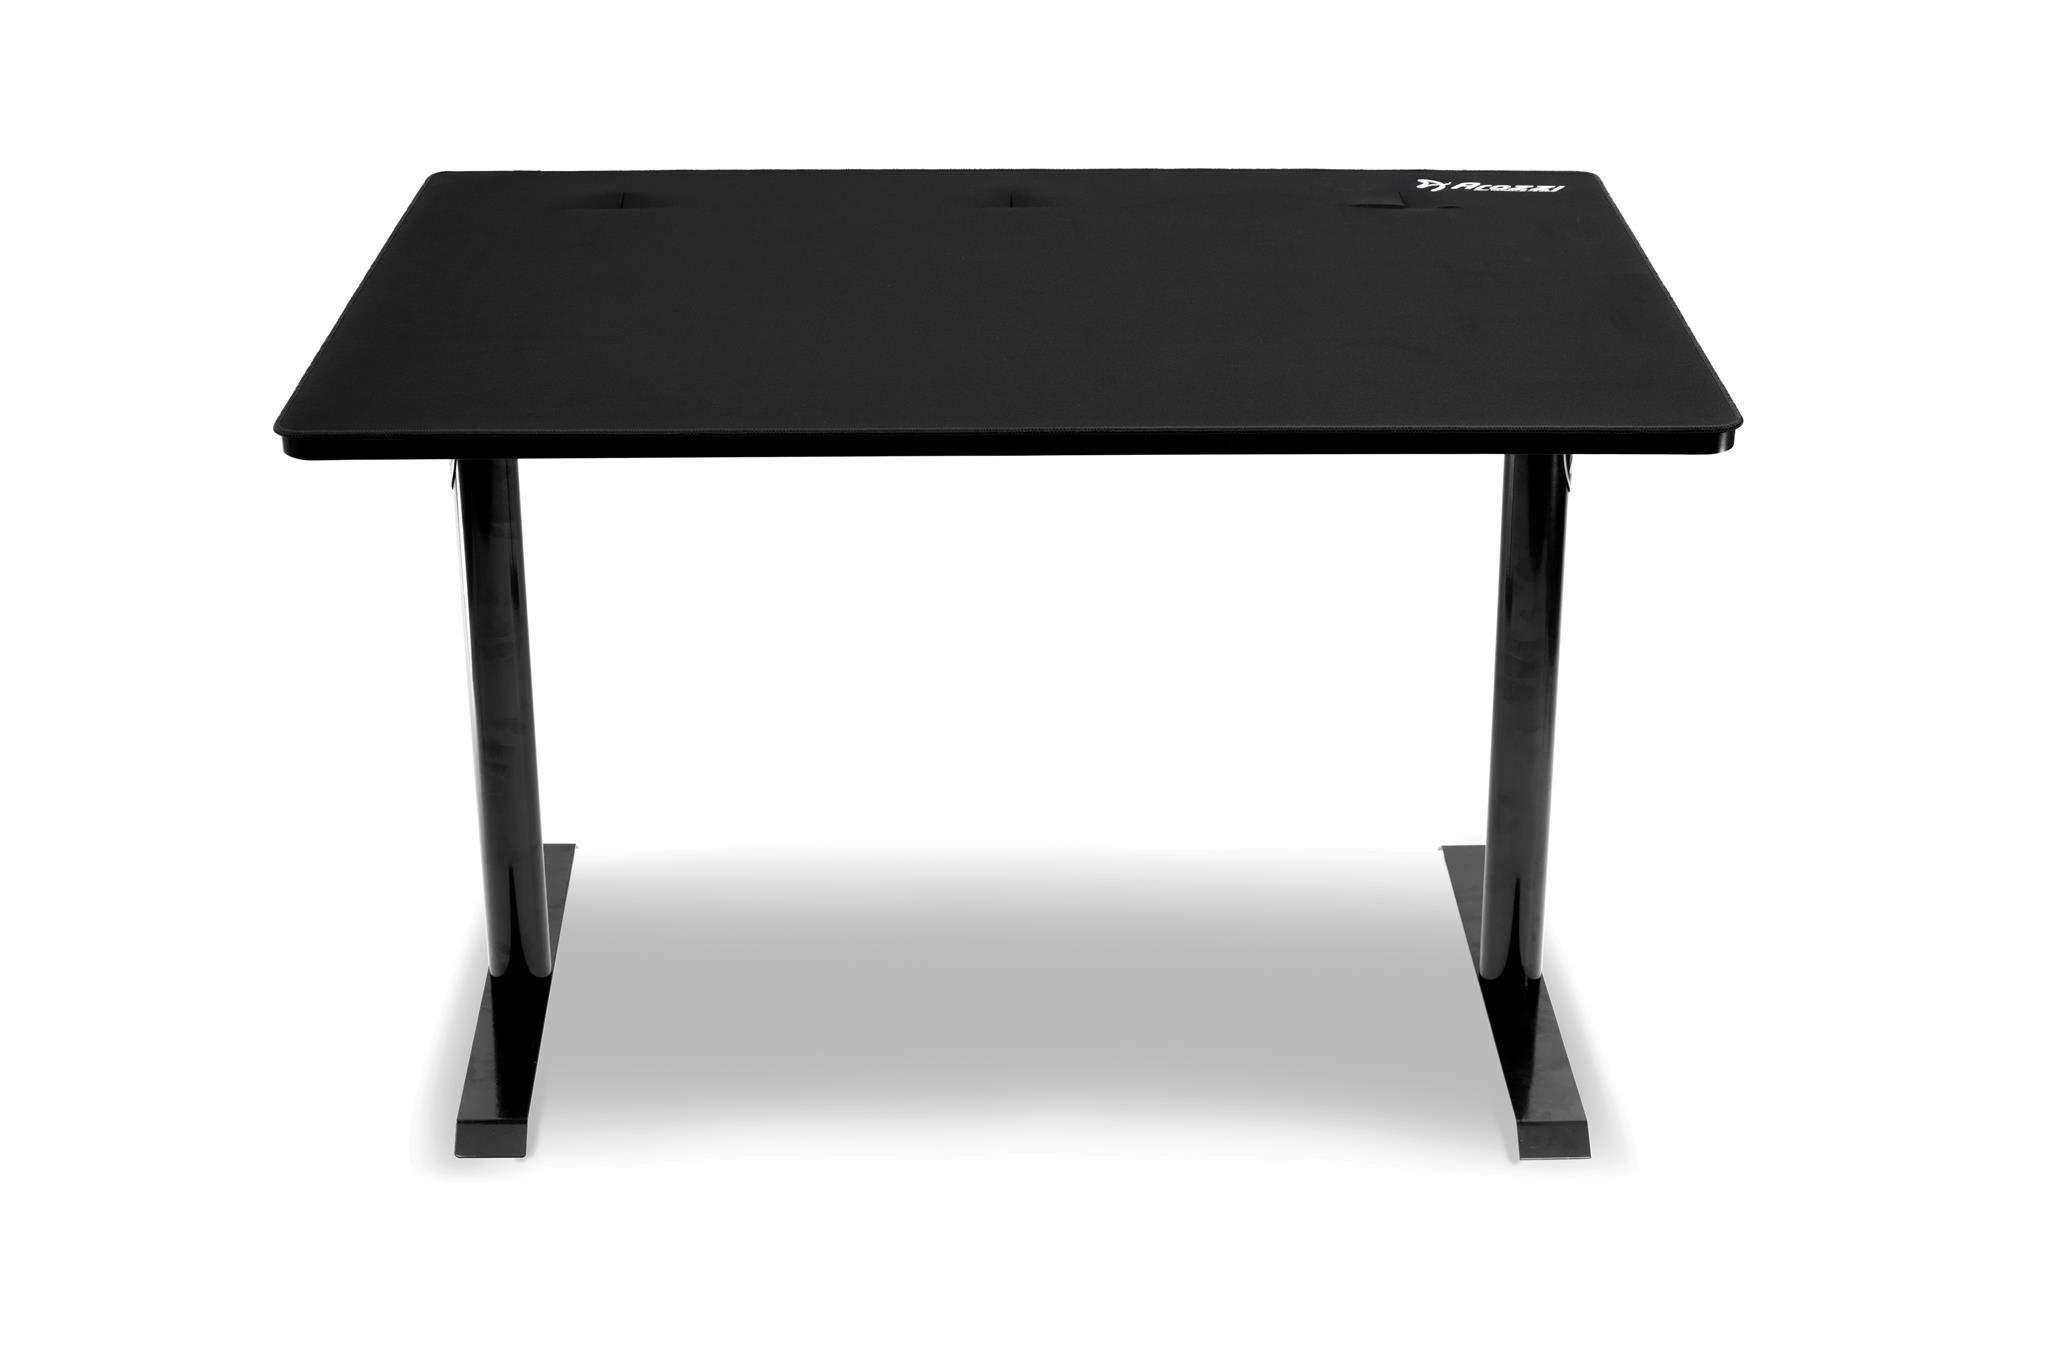 Arozzi Arena Leggero Compact Gaming Desk - Black by Arozzi